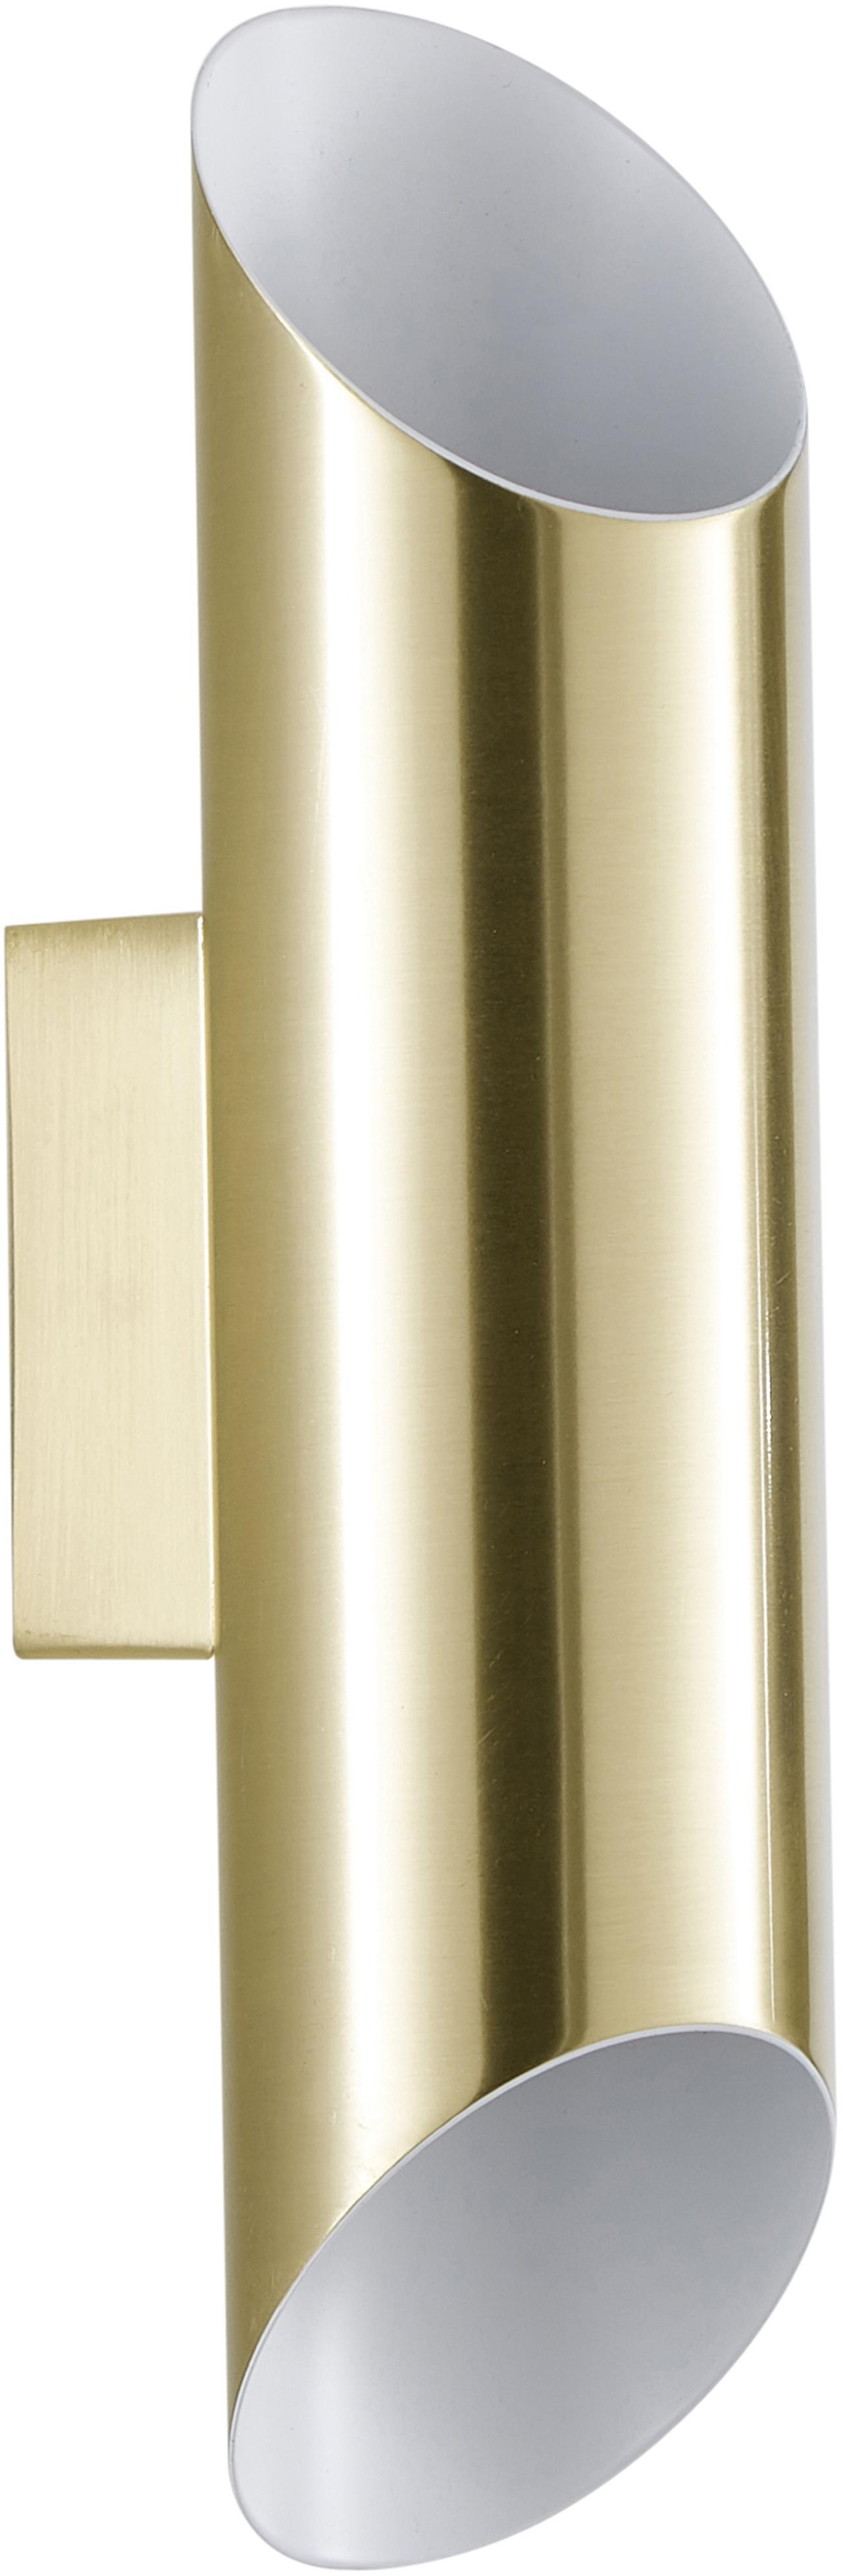 Aplique Renee, Fijación: metal cepillado, Pantalla: metal cepillado, Dorado mate, An 7 x Al 28 cm